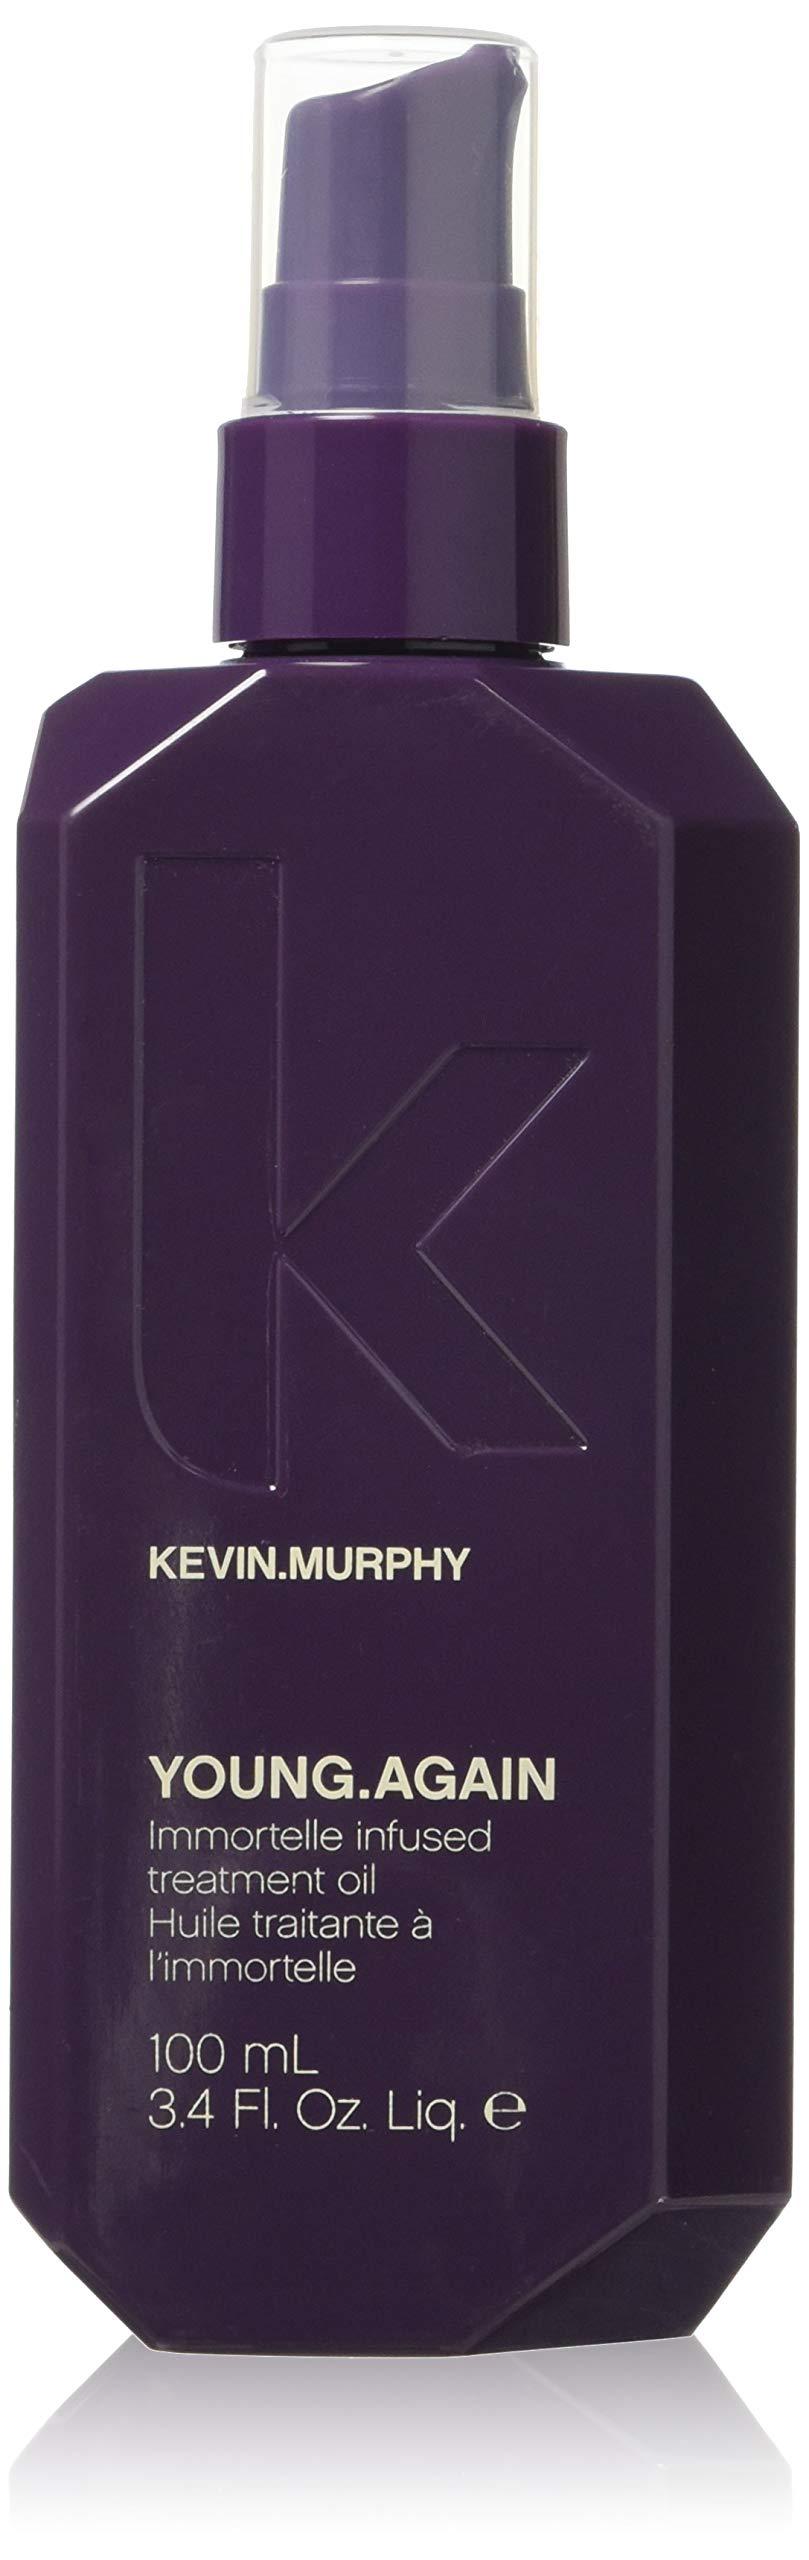 Kevin Murphy Young Again 100 ml/ 3.4 fl. oz liq.